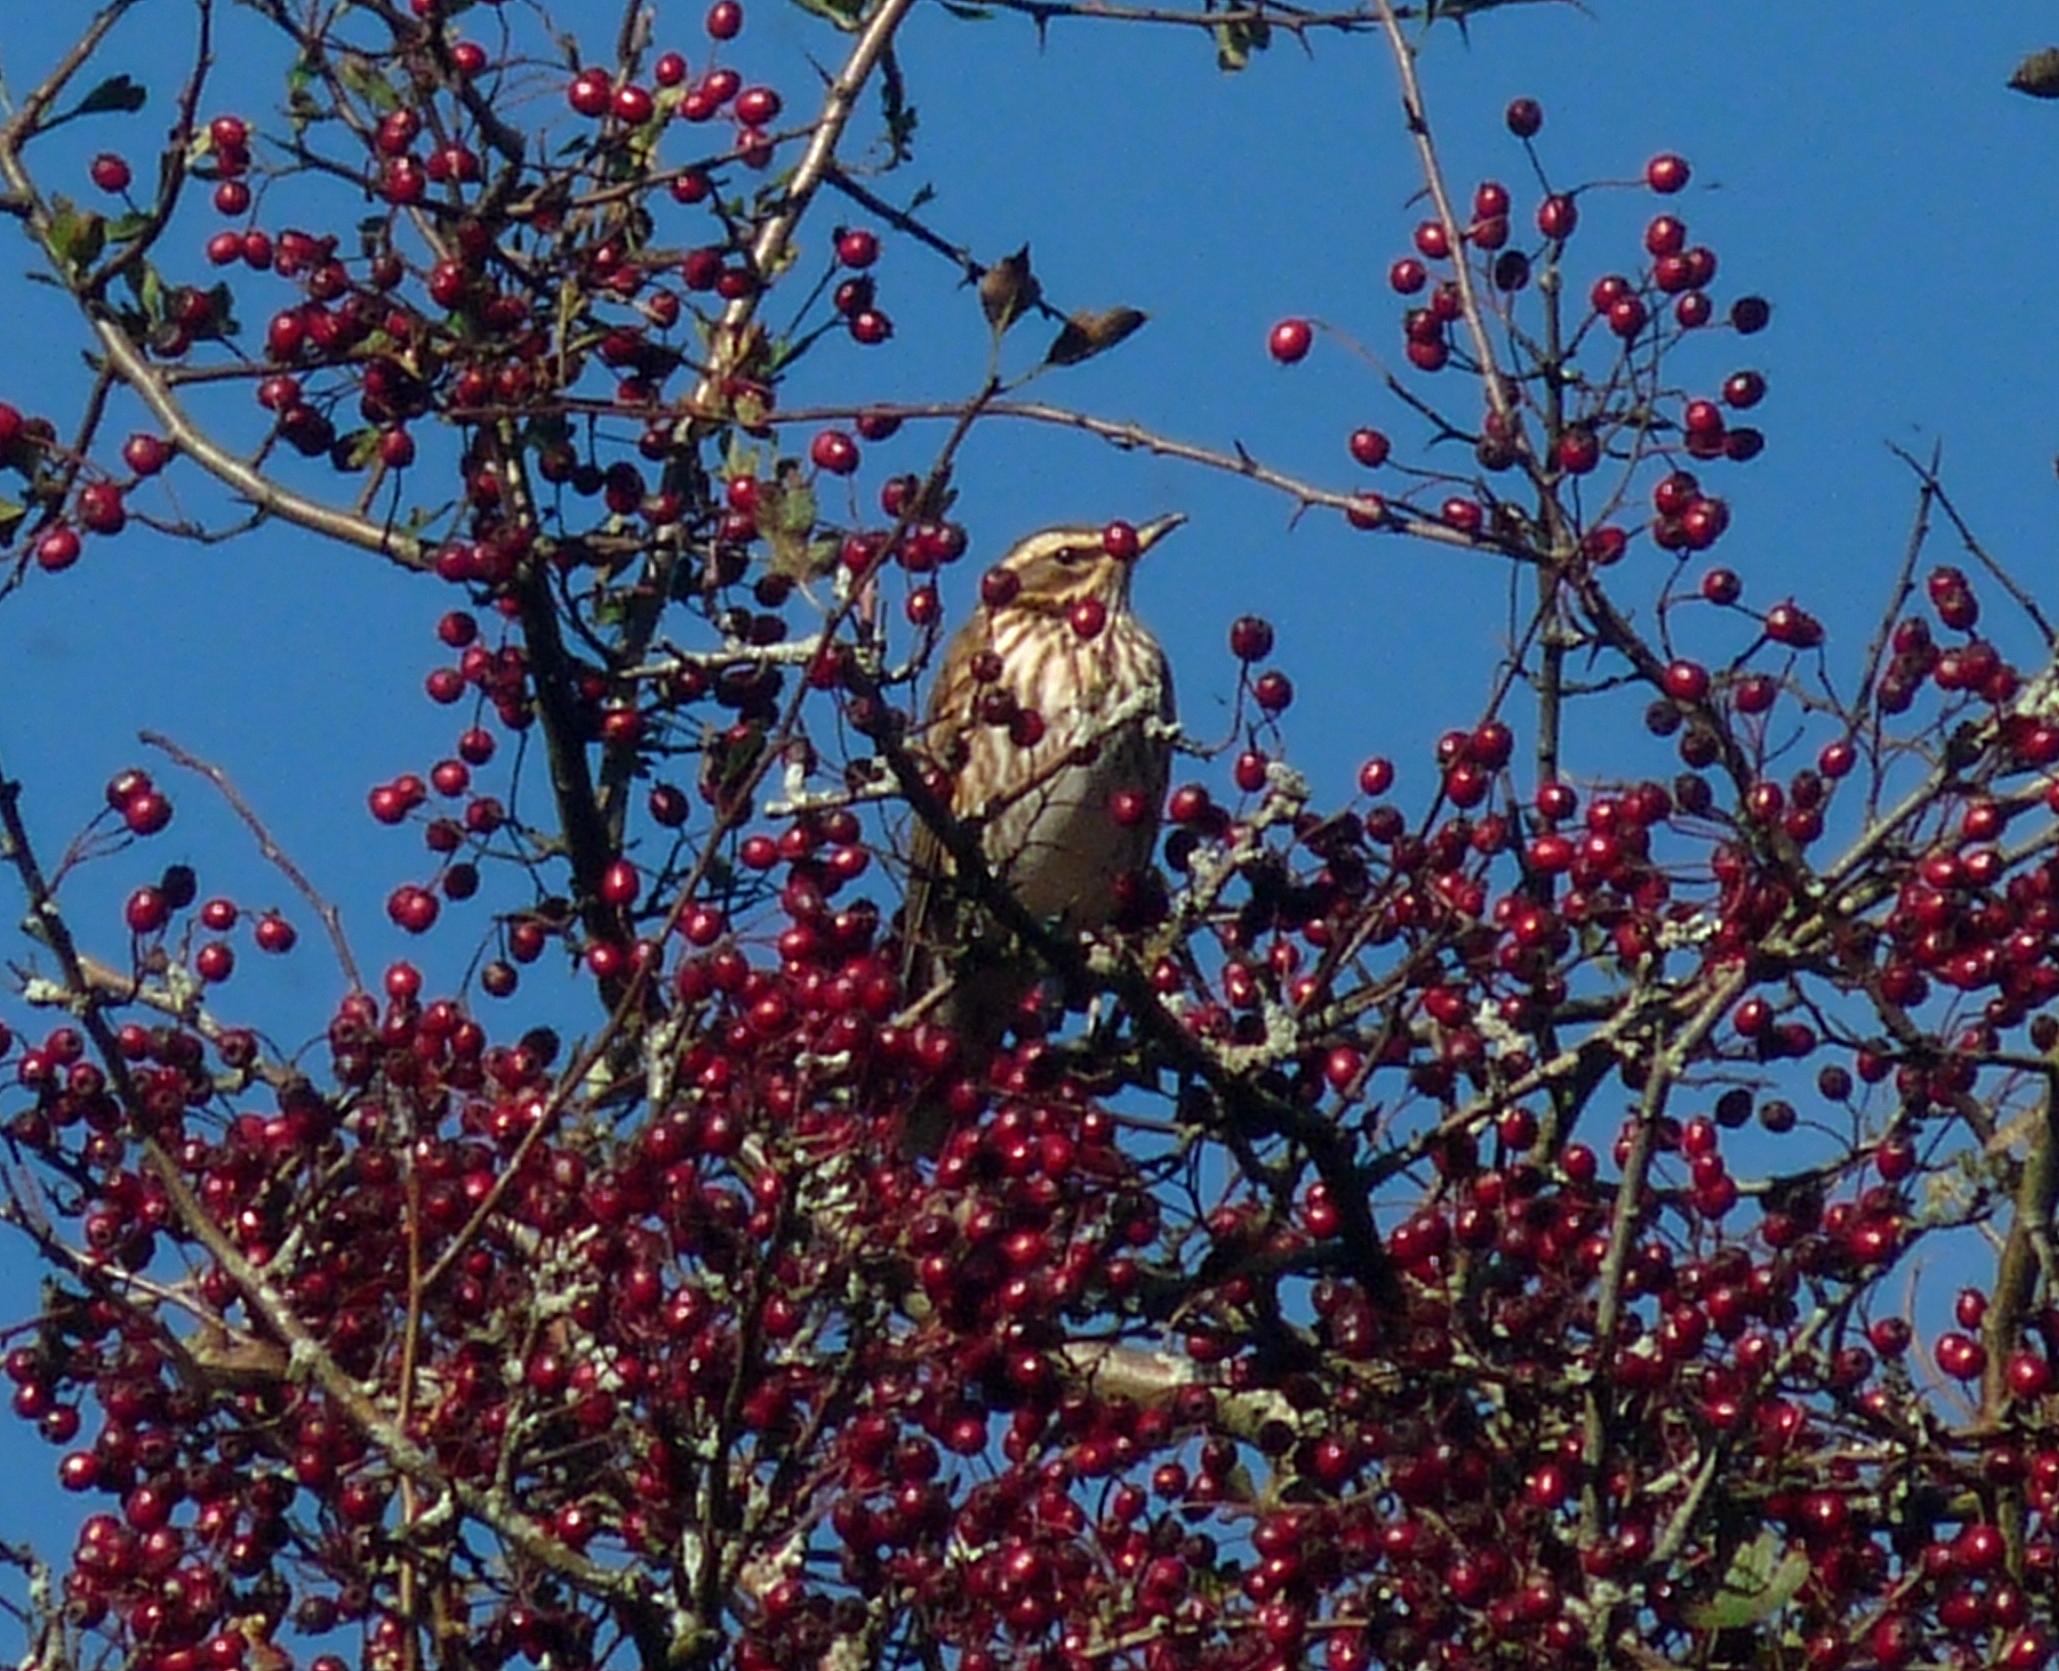 Hawthorn Tree Berries Berries And Fruit on Trees